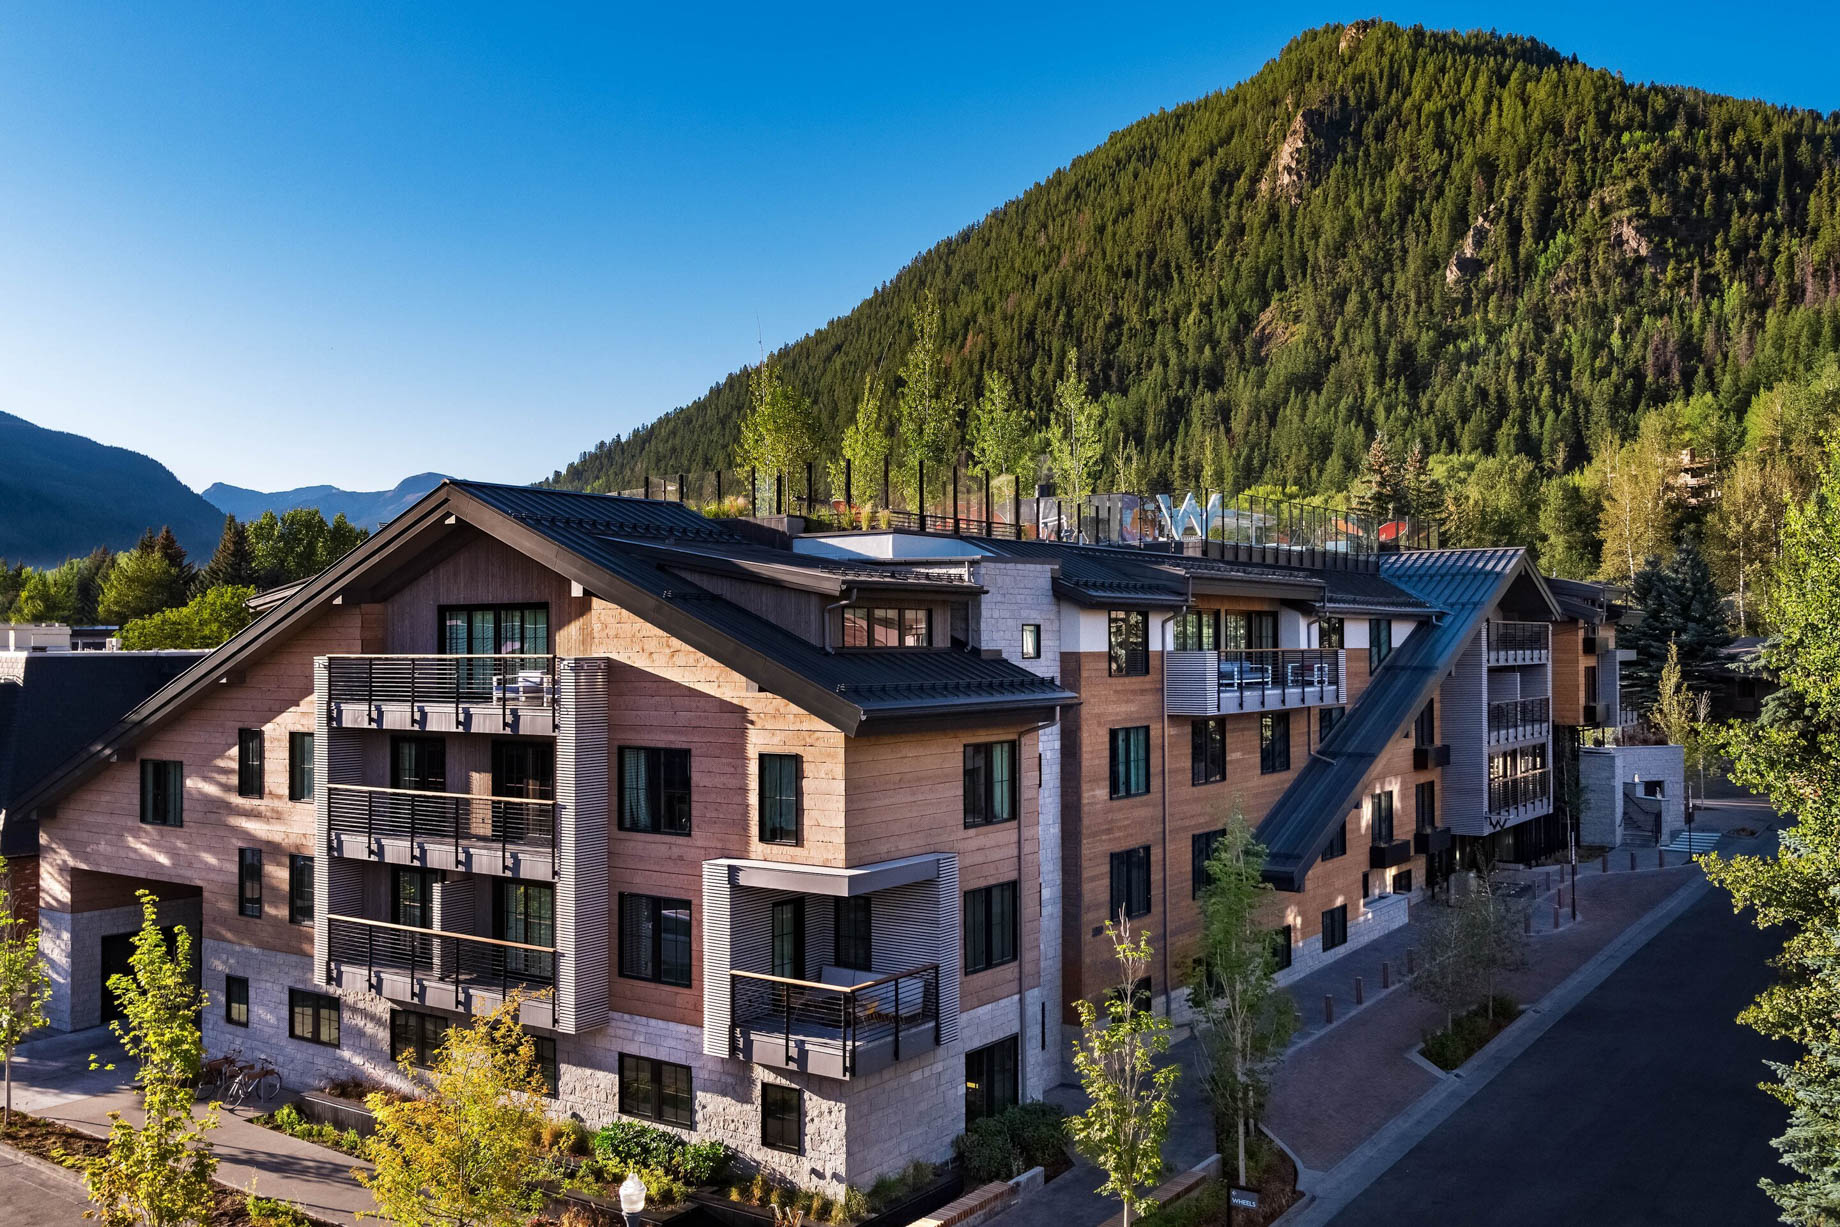 W Aspen Luxury Hotel - Aspen, CO, USA - Hotel Exterior Mountain View